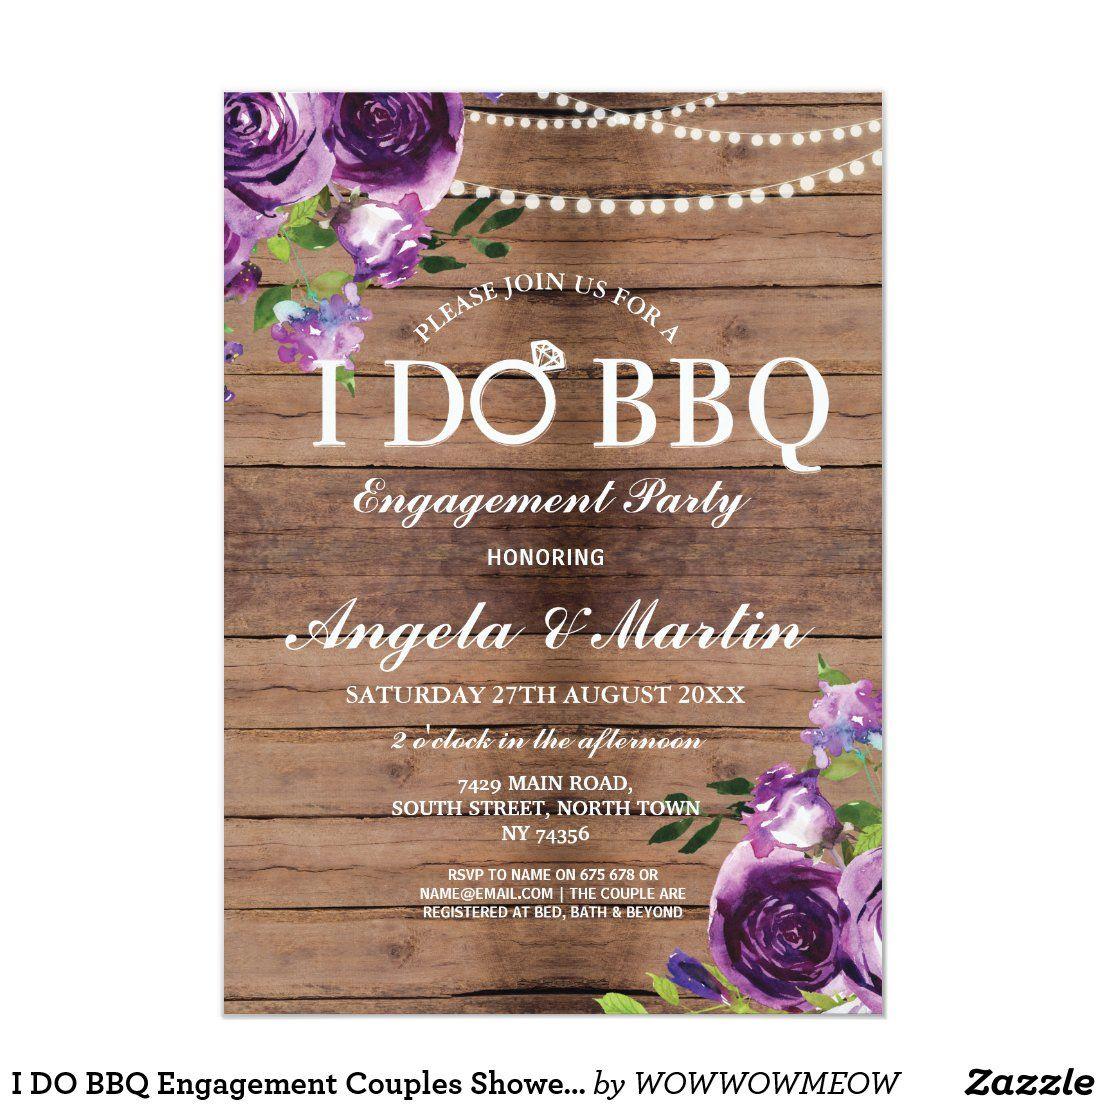 I DO BBQ Engagement Couples Shower Purple Floral